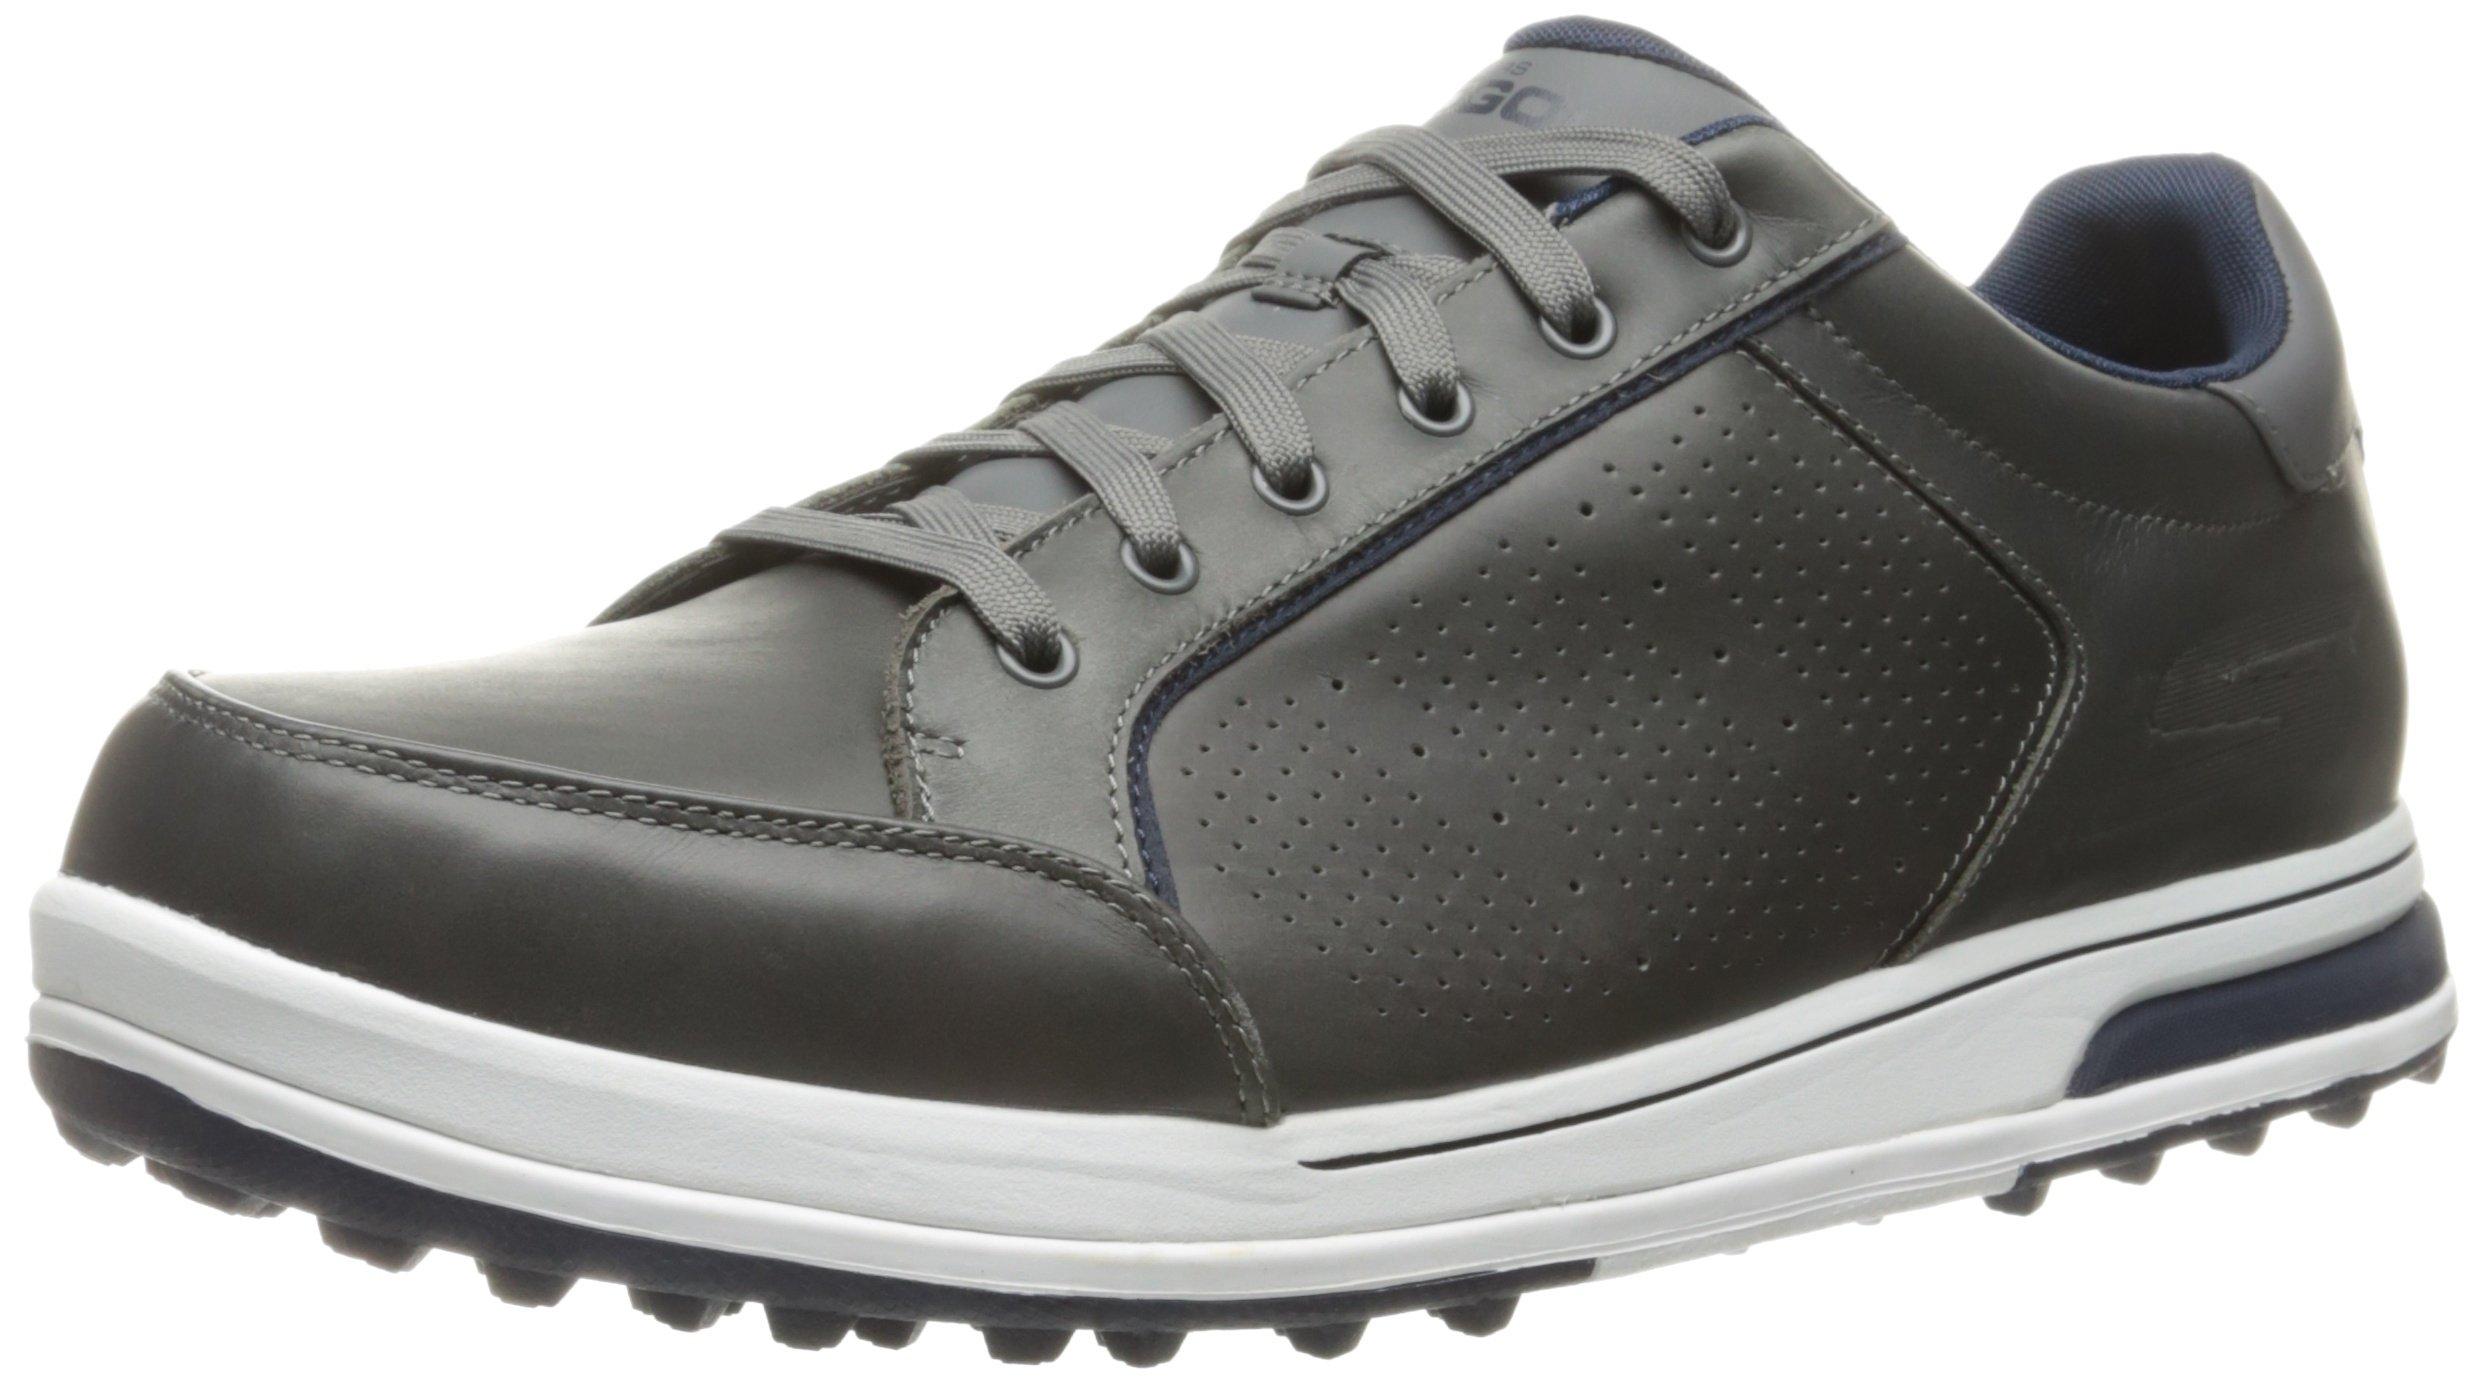 Skechers Men's Go Golf Drive 2 Lx Golf Shoe,Charcoal/Navy,12 M US